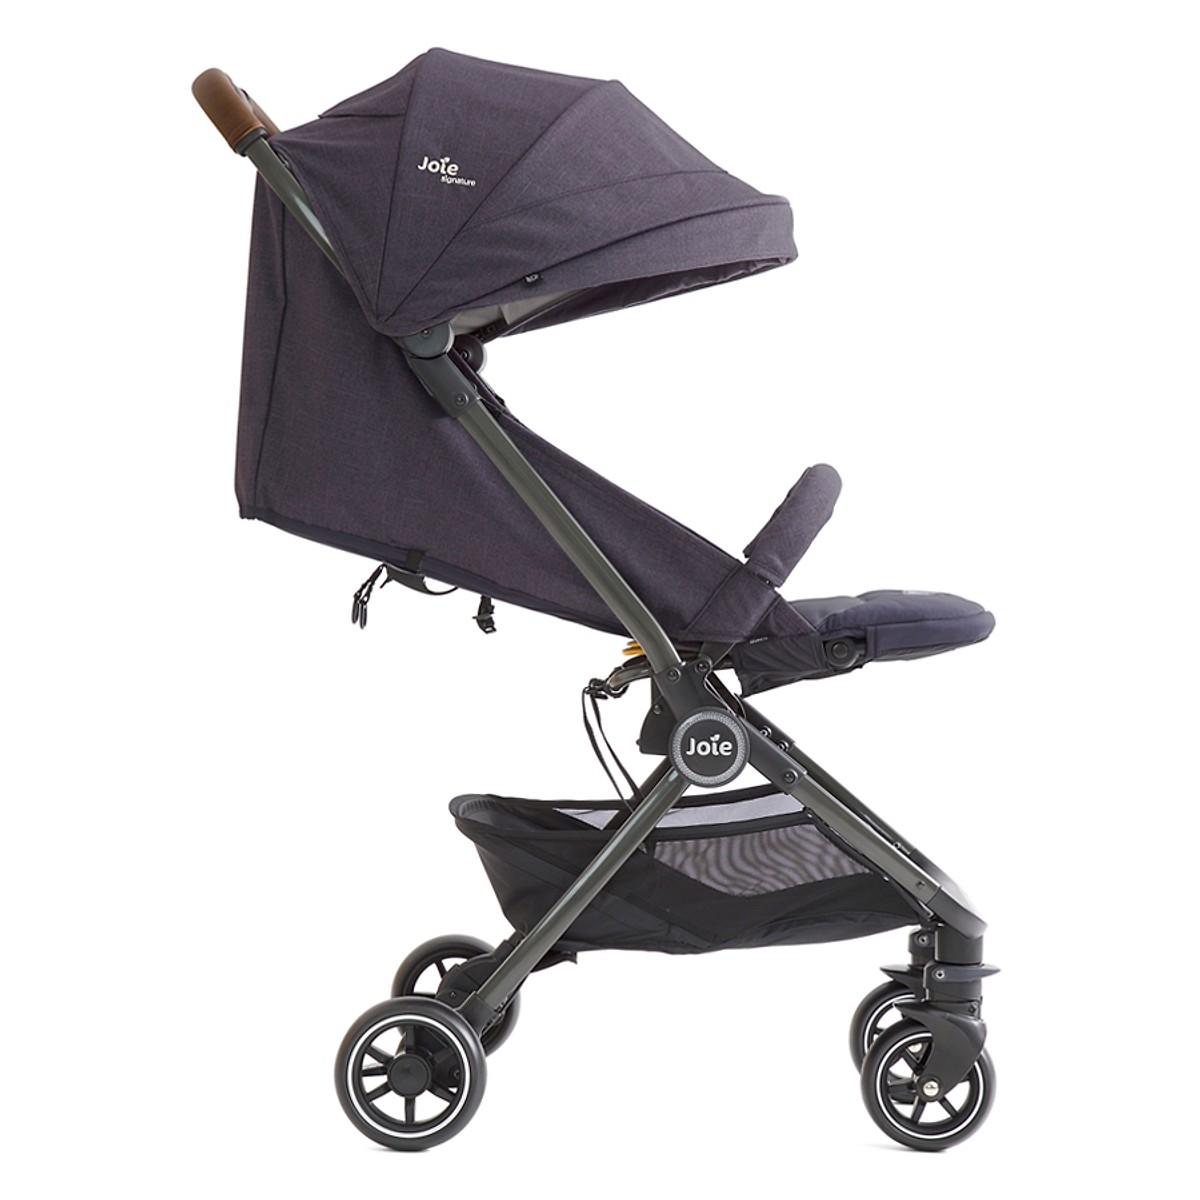 Xe đẩy trẻ em Joie Litetrax 4 Flex W/ RC SIG. Granit Bleu